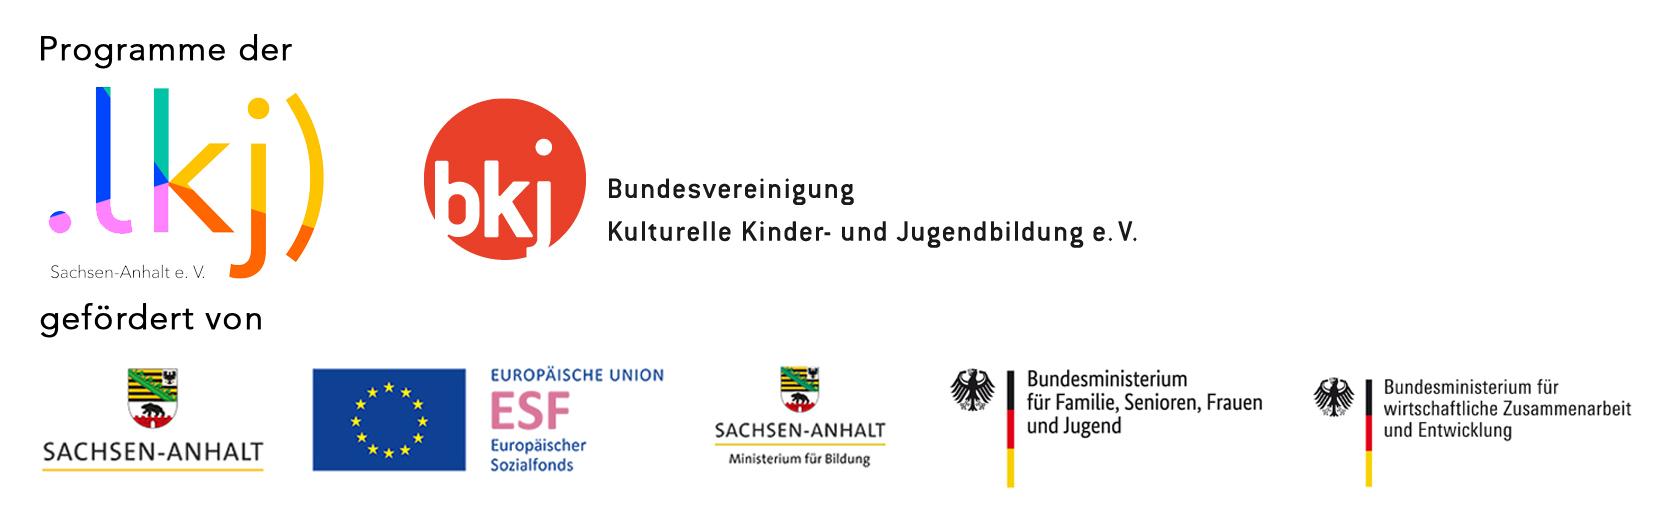 Förderung - Logos FWD